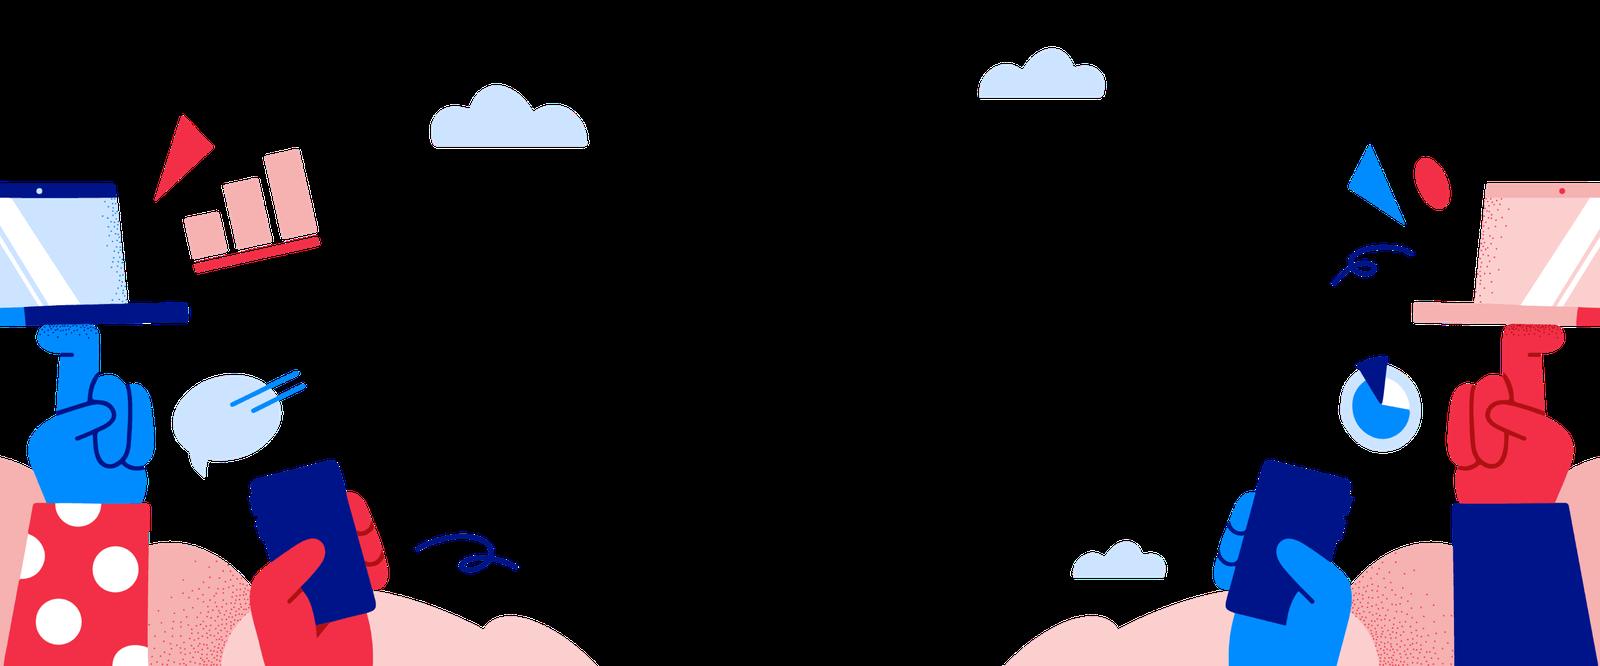 platform-hero-illustration